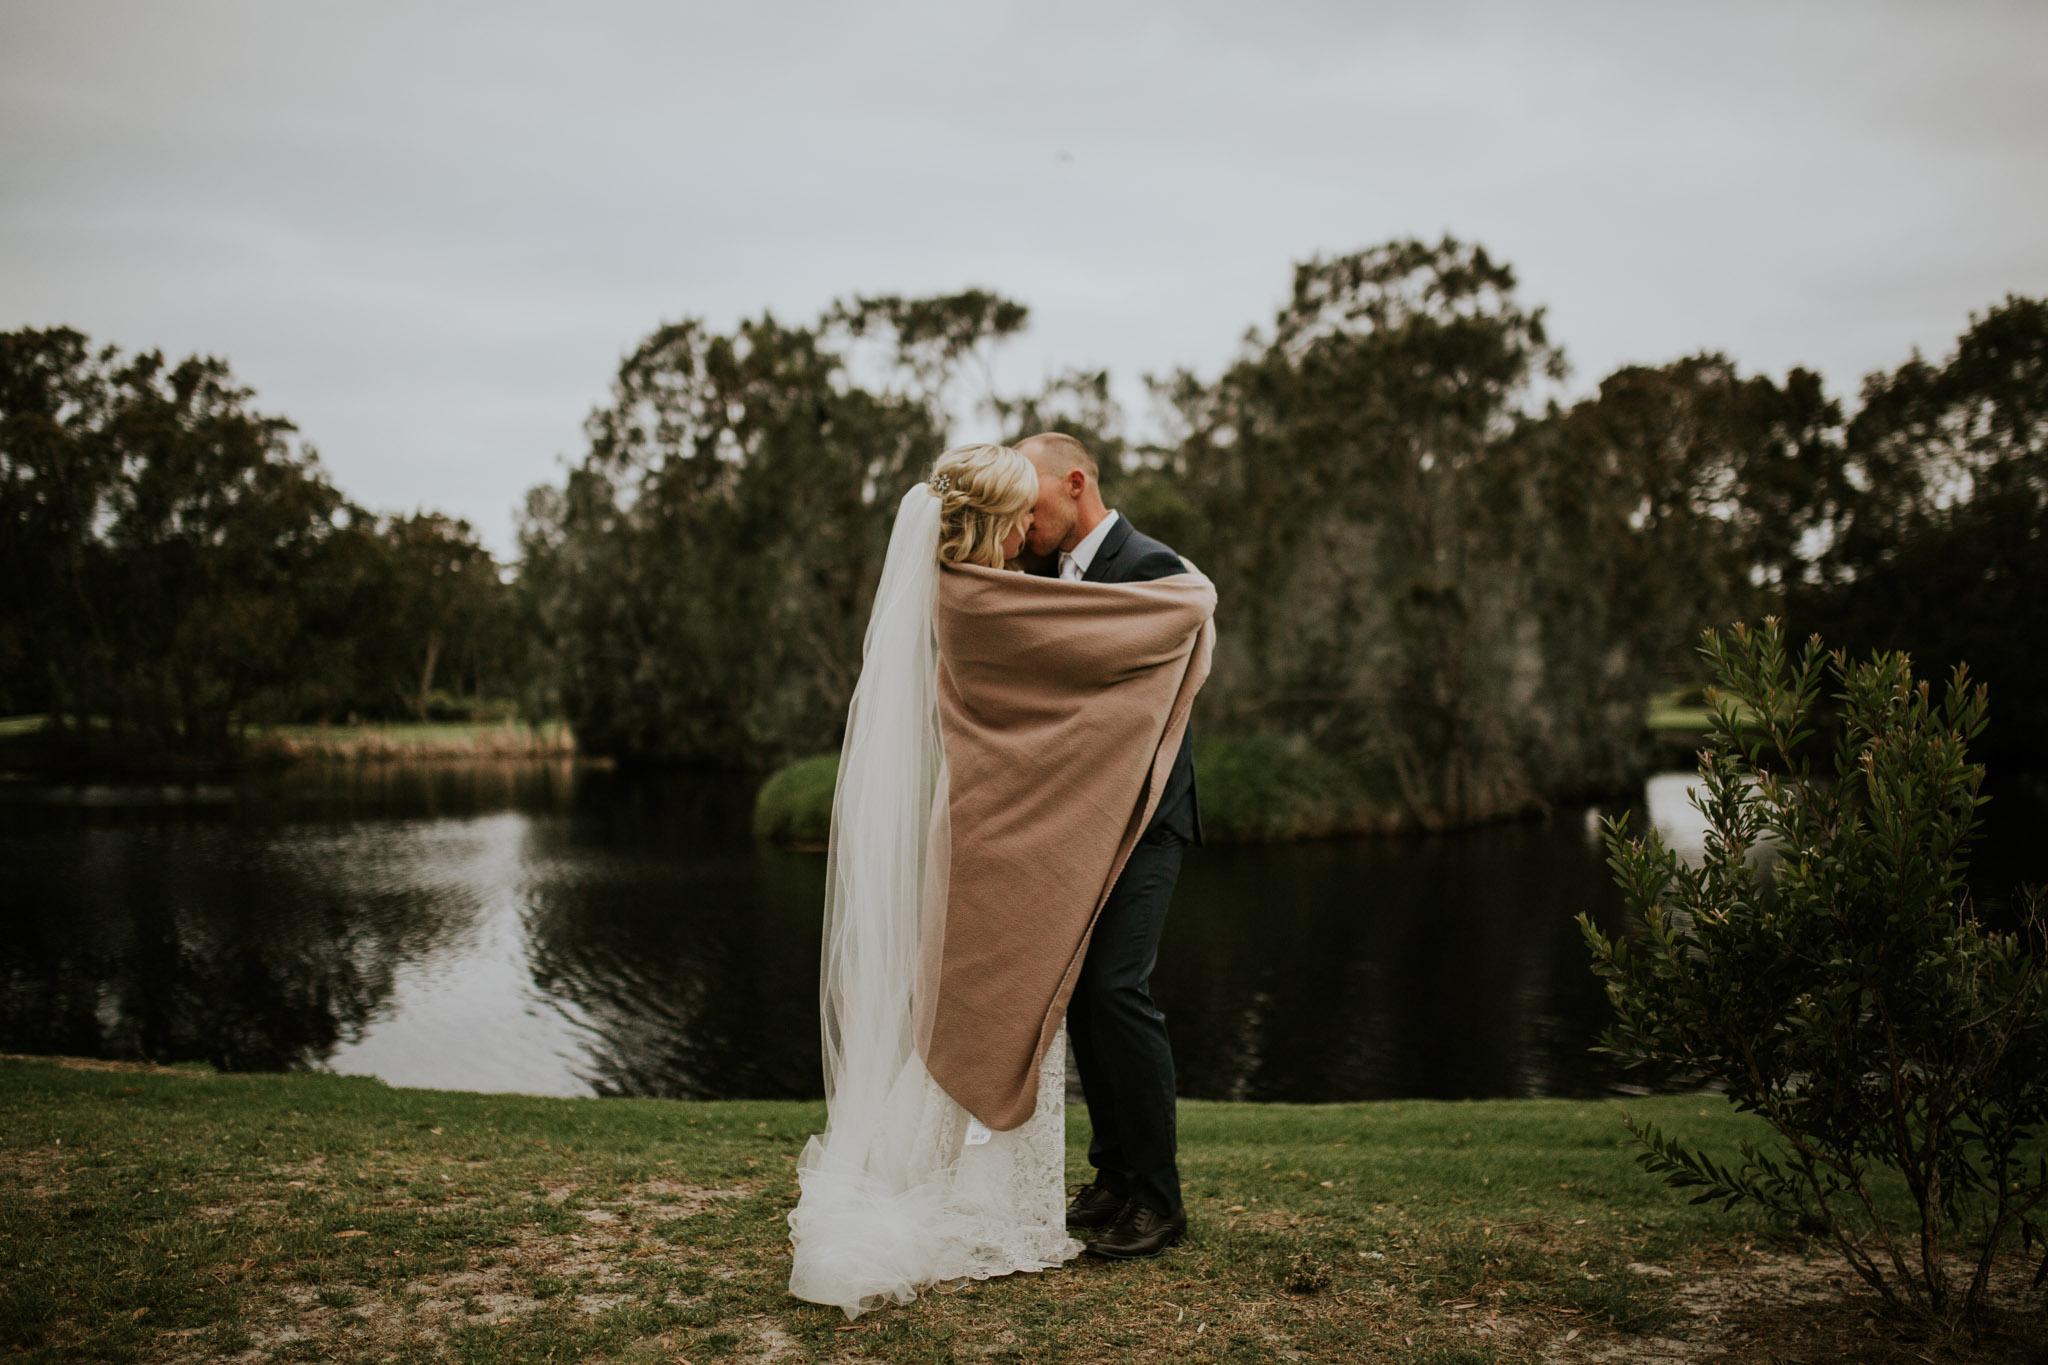 Shanan & Traci_Portkembla Golf Course Wedding-64.jpg